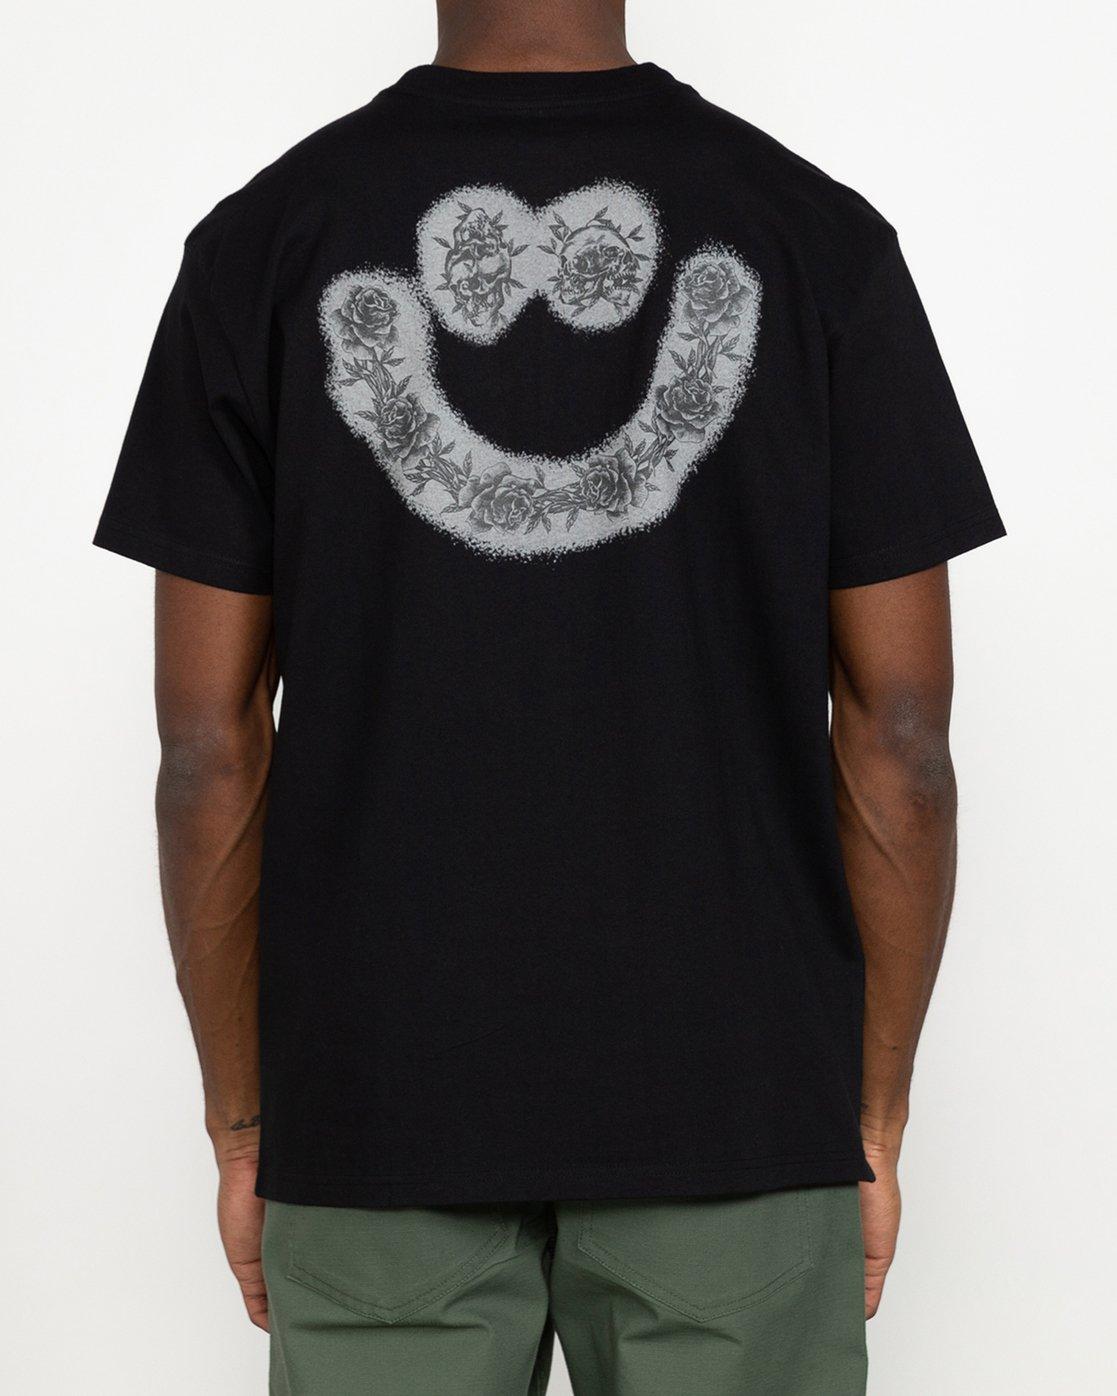 5 Benjamin JeanJean Skulls And Roses - T-Shirt for Men Black U1SSSSRVF0 RVCA